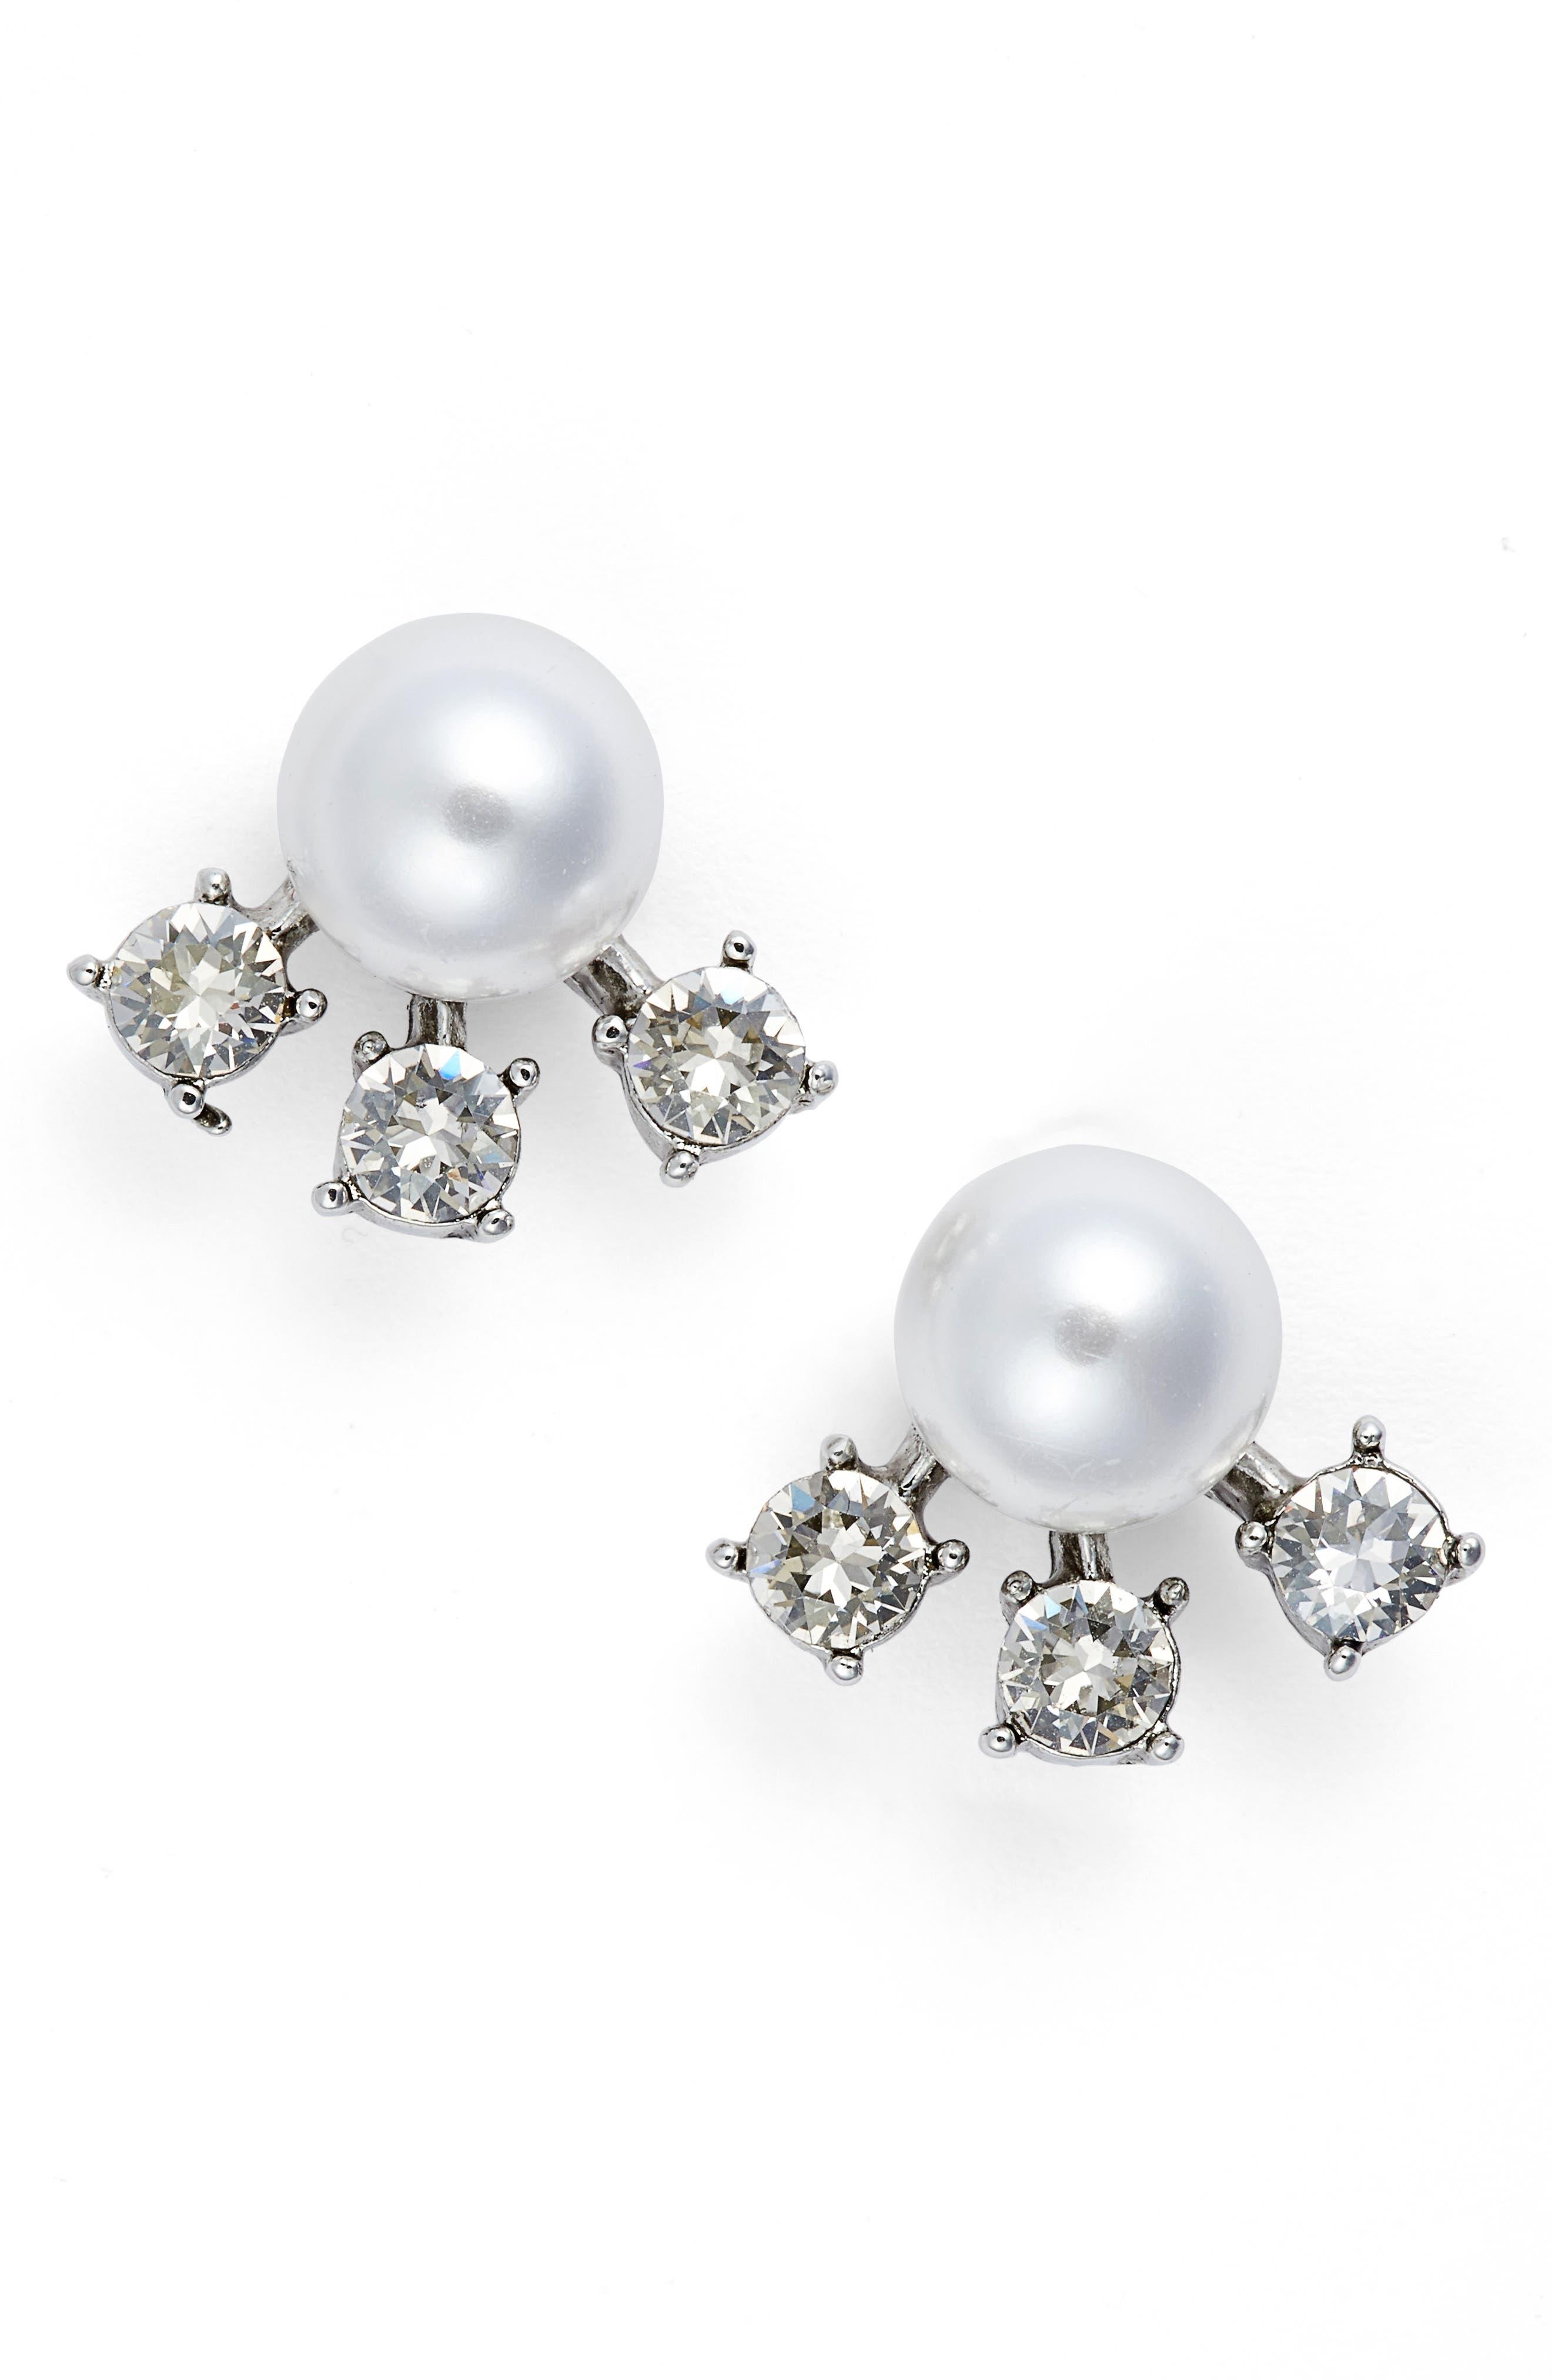 Main Image - Oscar de la Renta Simulated Pearl & Crystal Ear Jackets